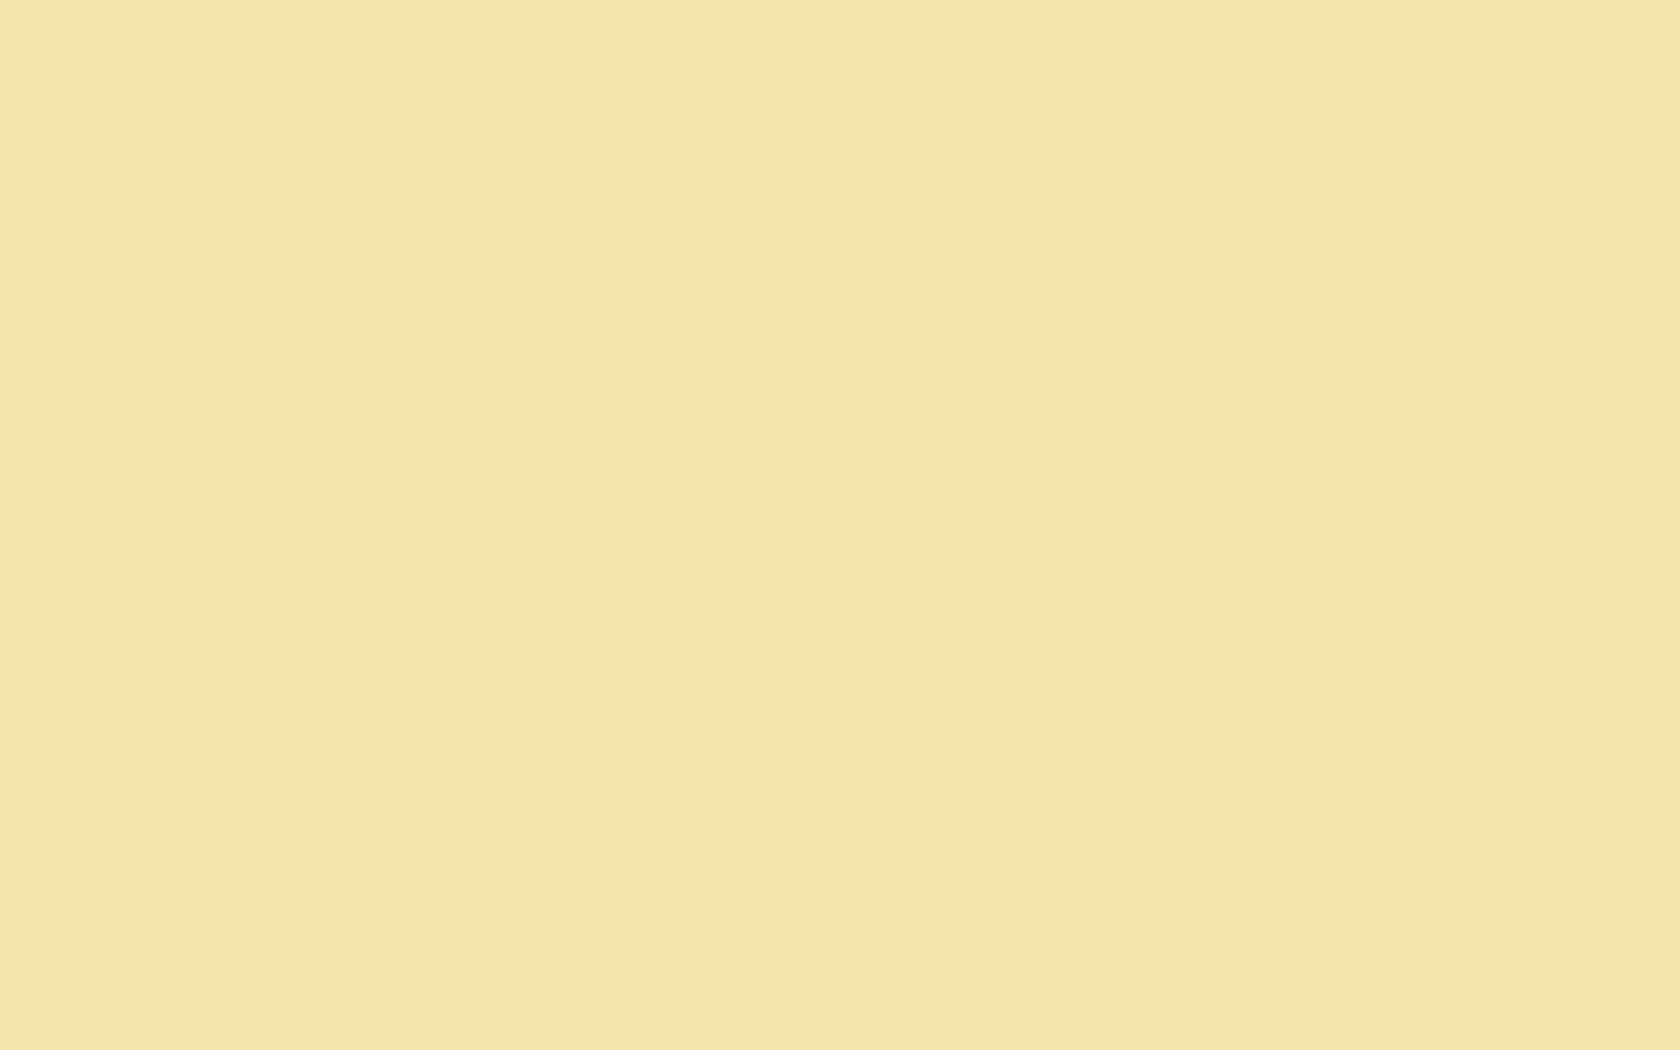 1680x1050 Vanilla Solid Color Background